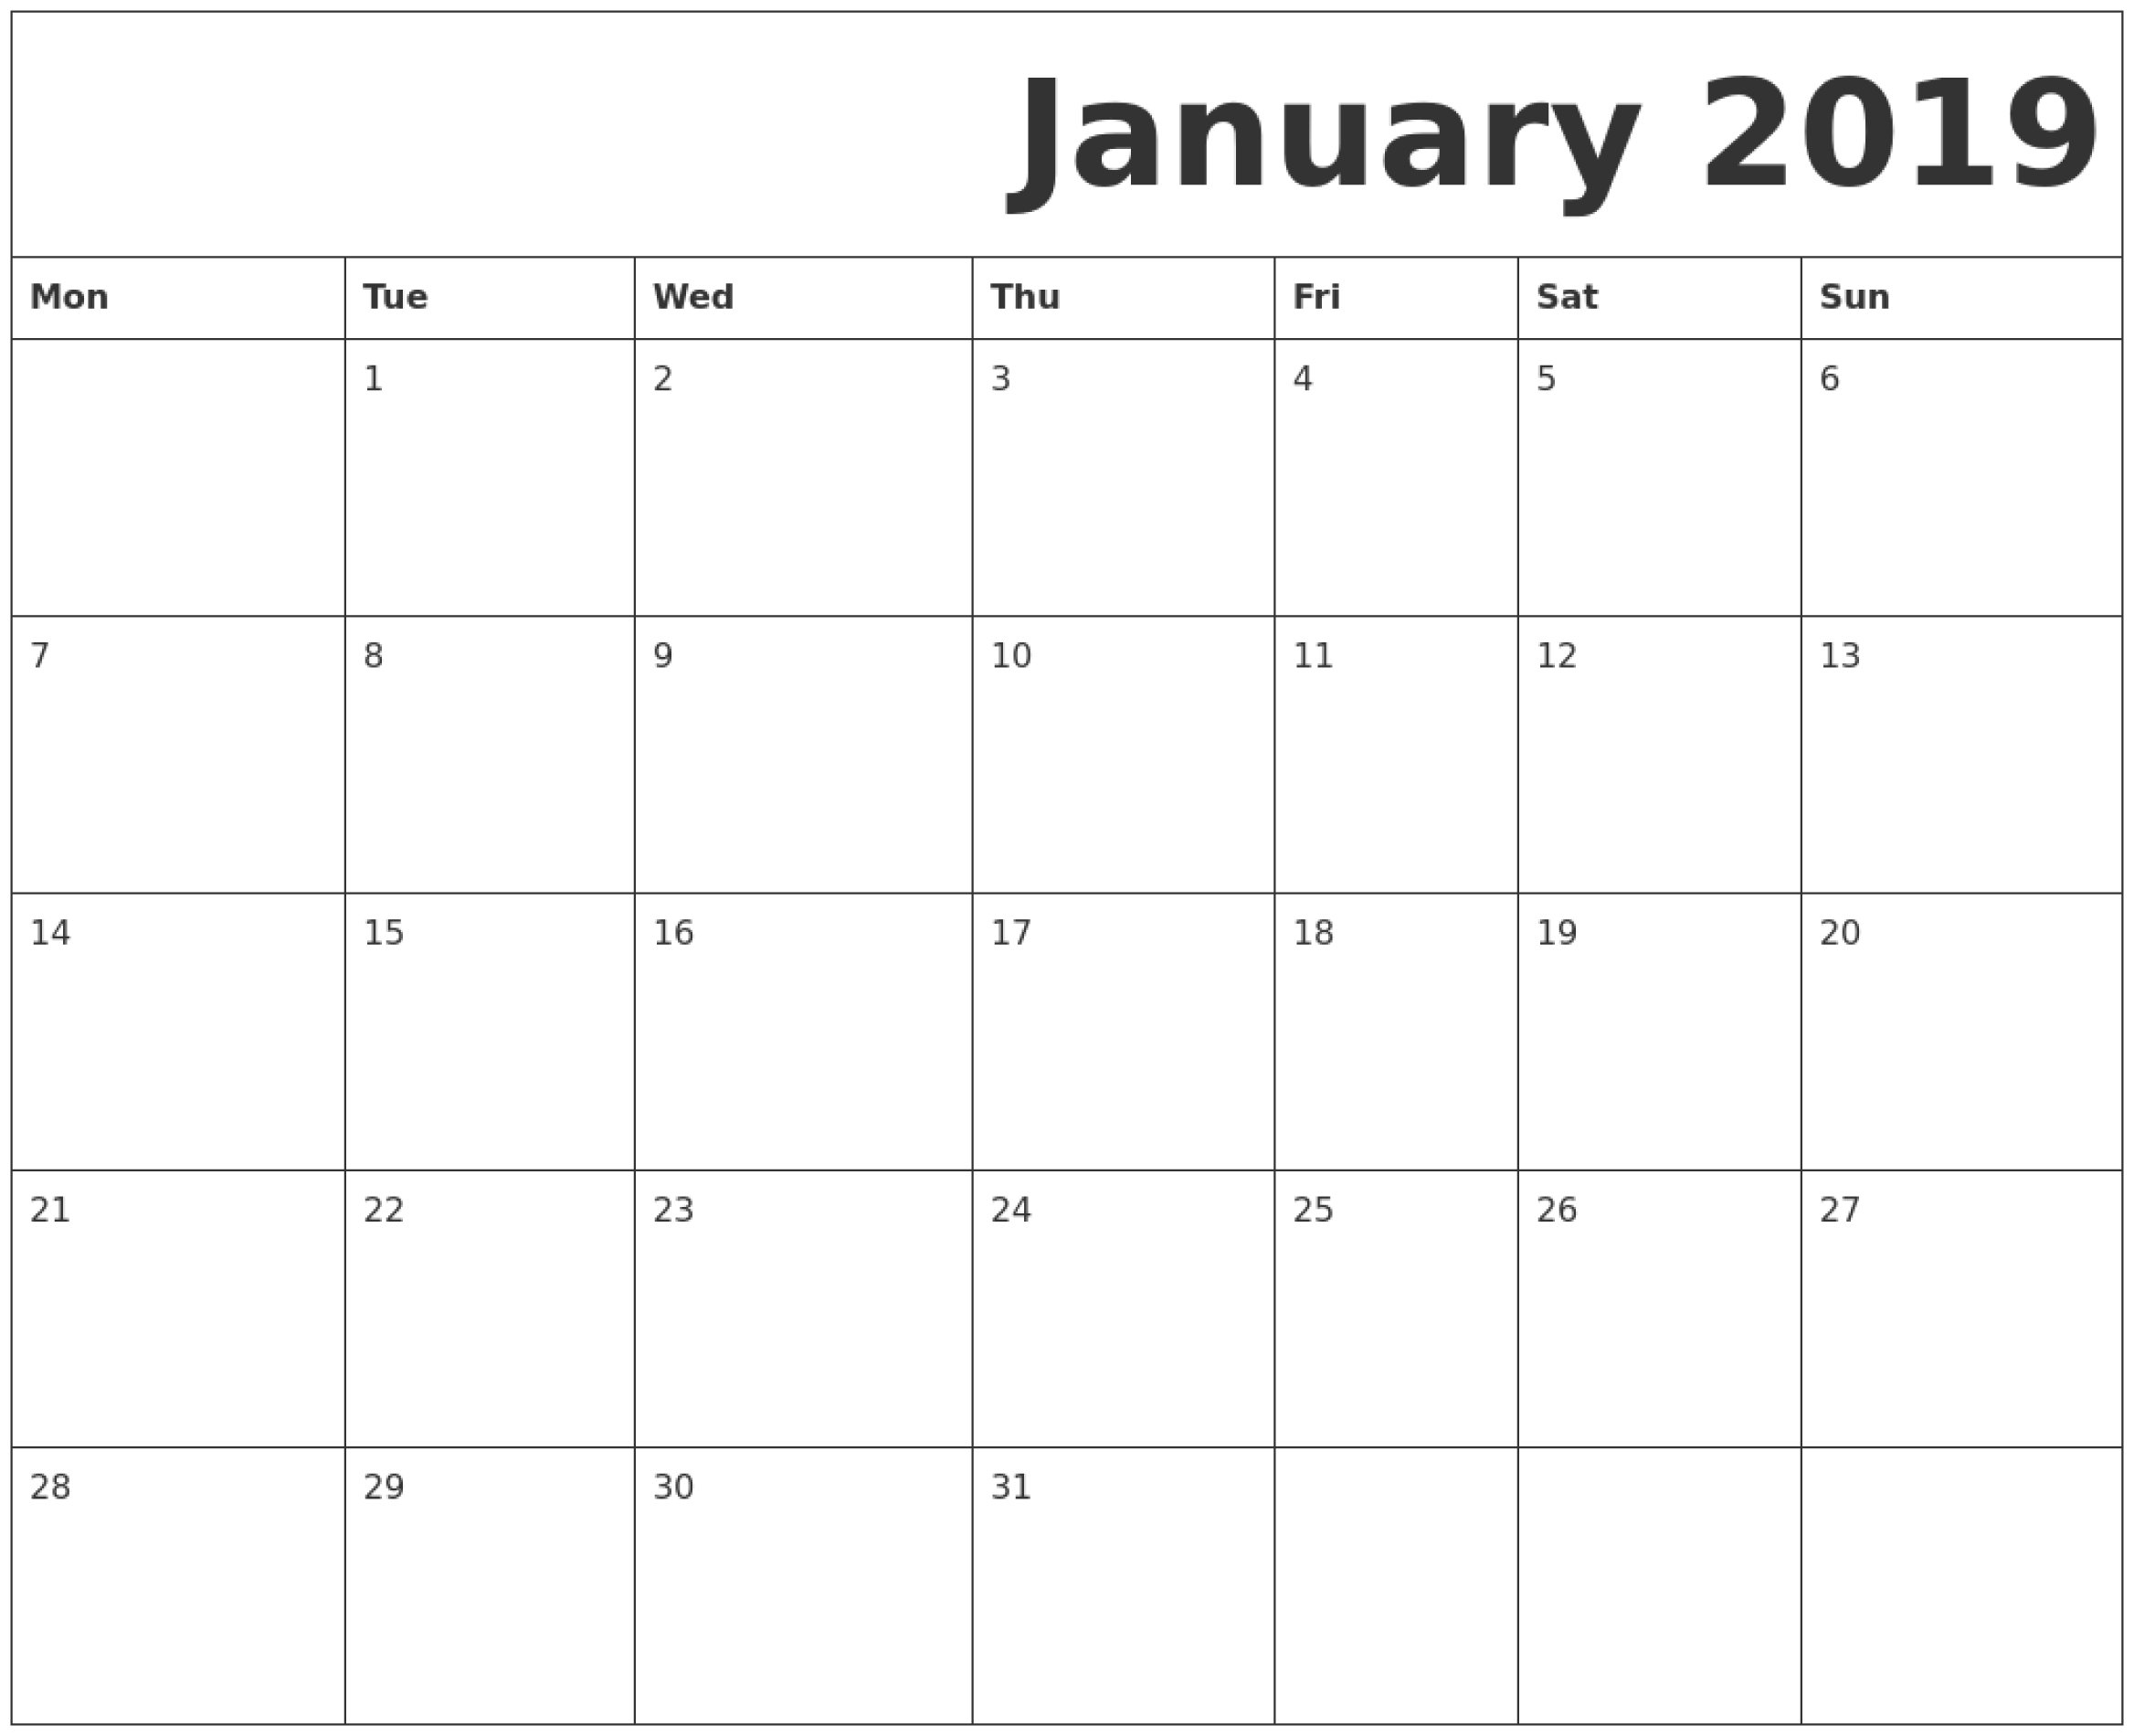 January 2019 Printable Calendar Monday Start. | June Remarkable Monthly Calendar Starts On Monday